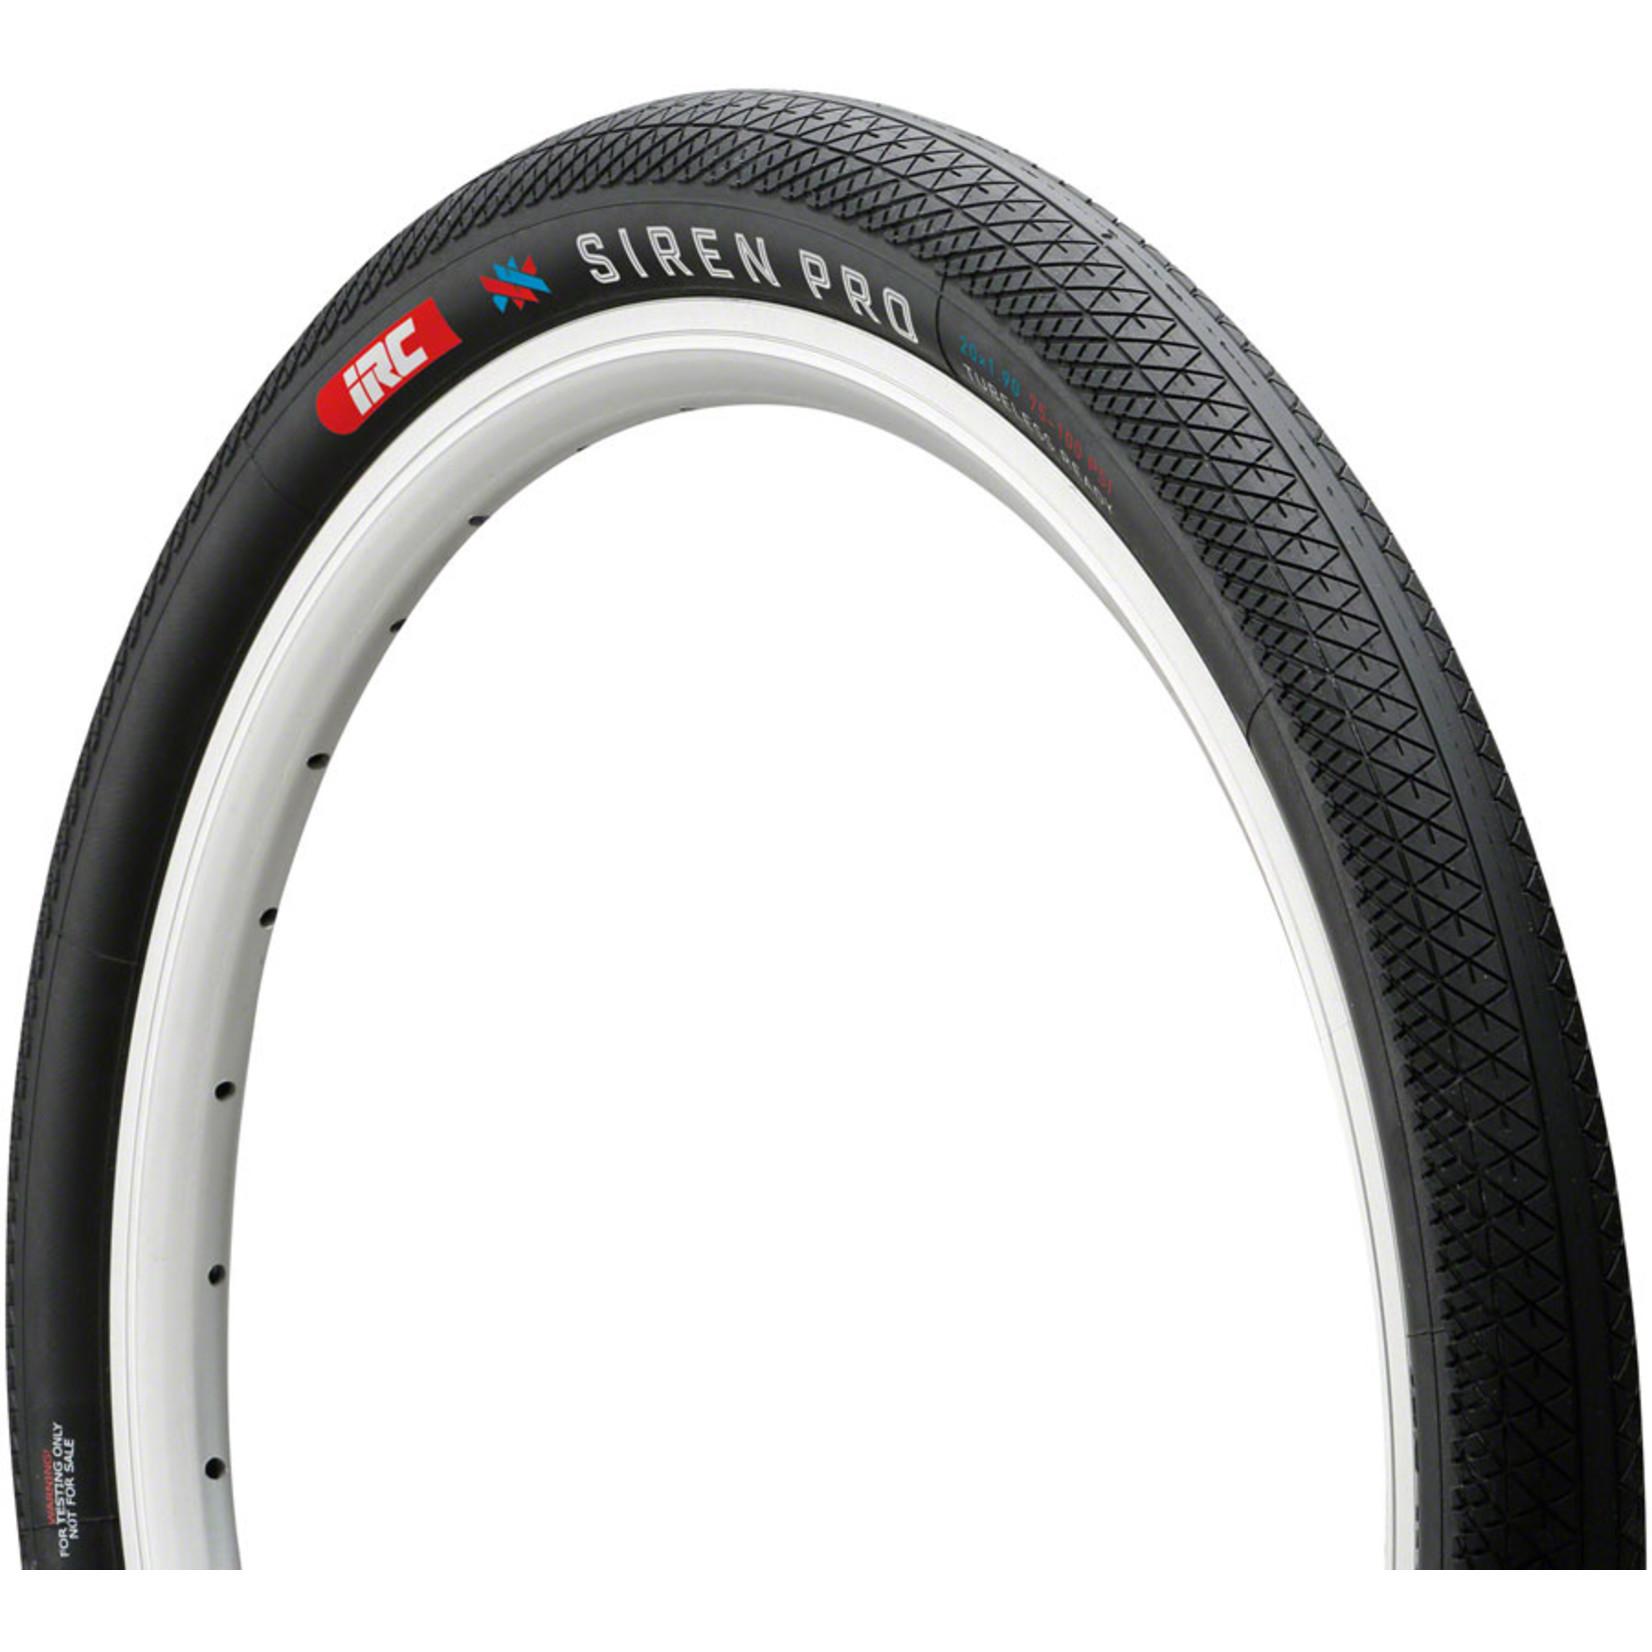 "IRC Tires IRC Tire Siren Pro Tire - 20 x 1.75""  Tubeless  Folding  Black 100Psi"